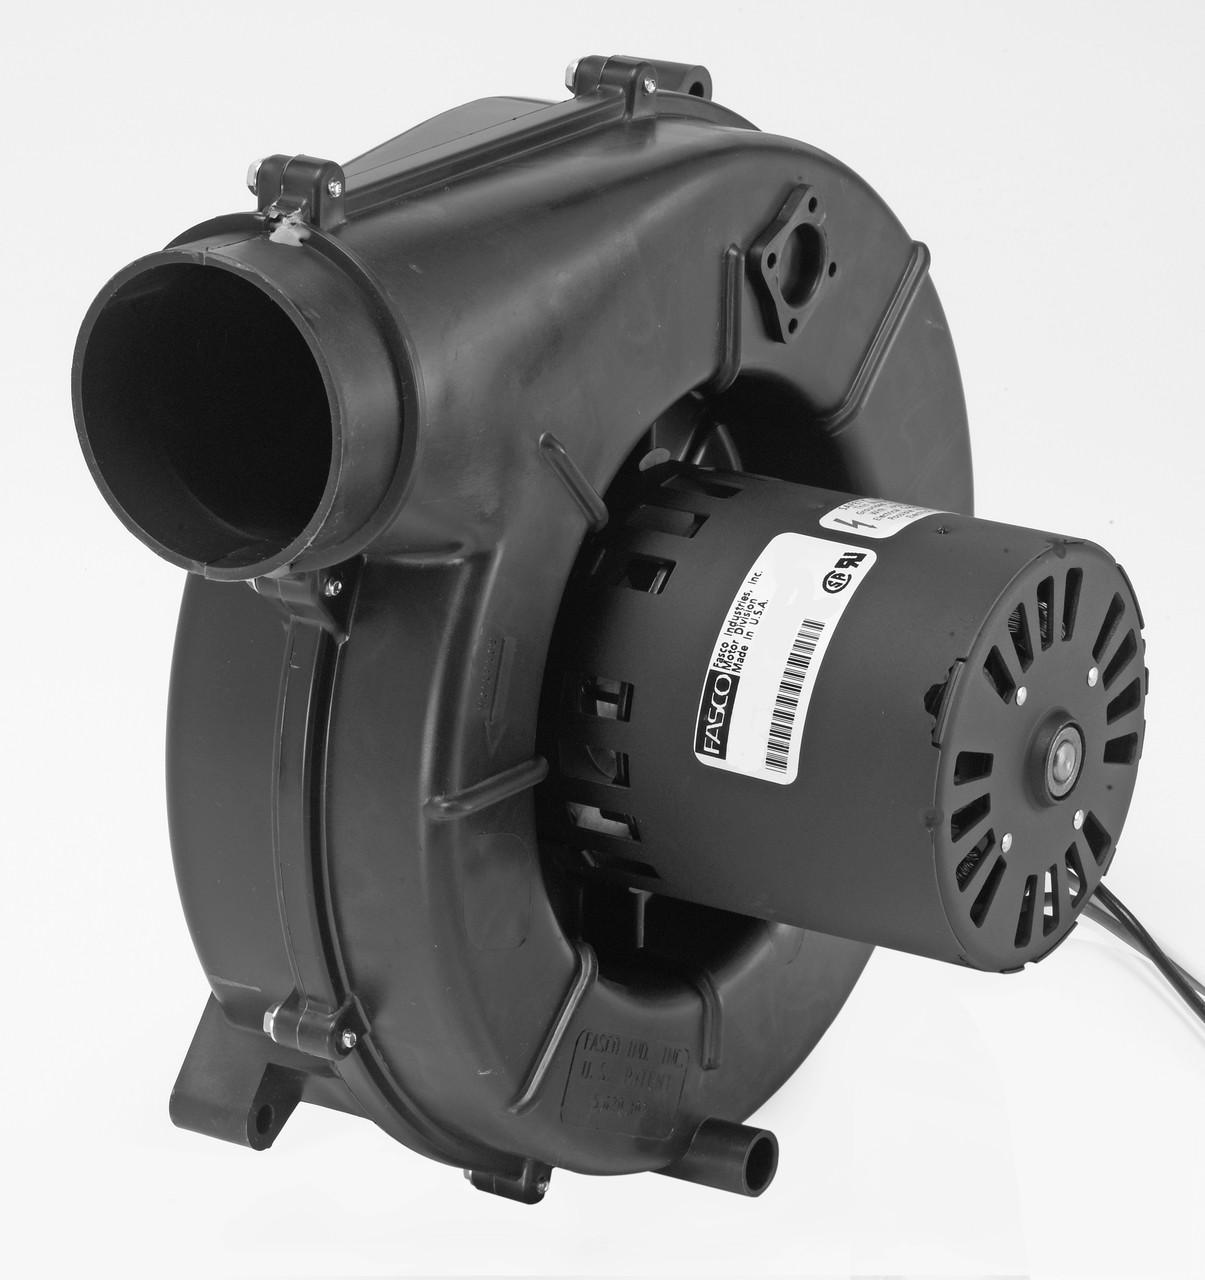 Trane Furnace Draft Inducer Blower 115V (7021-9011, D330757P01) Fasco on